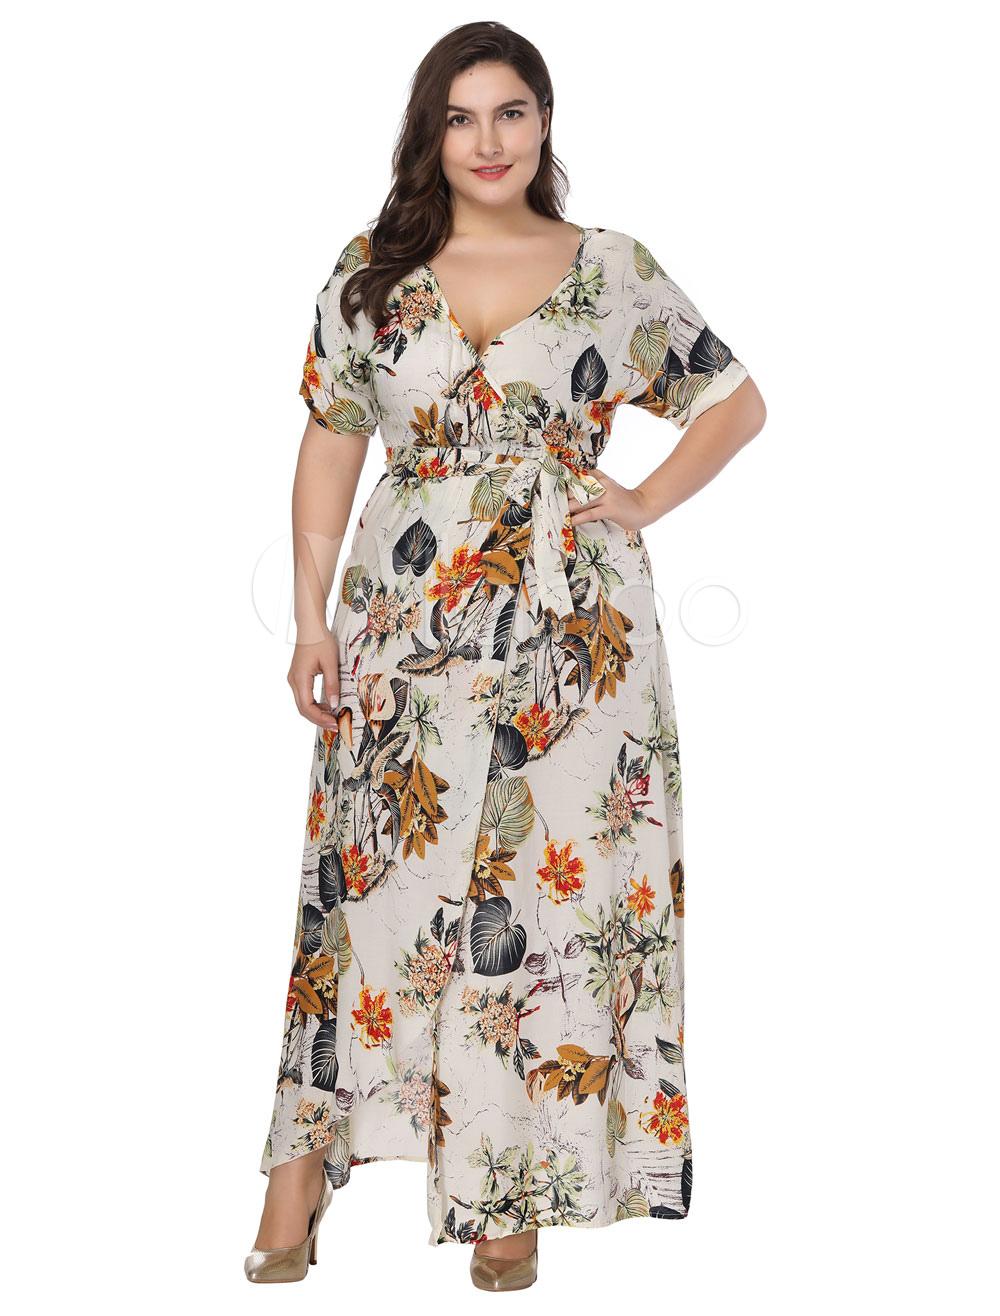 Plus Size Dress Floral Maxi Dress Women Split Short Sleeve Oversized Summer Dress